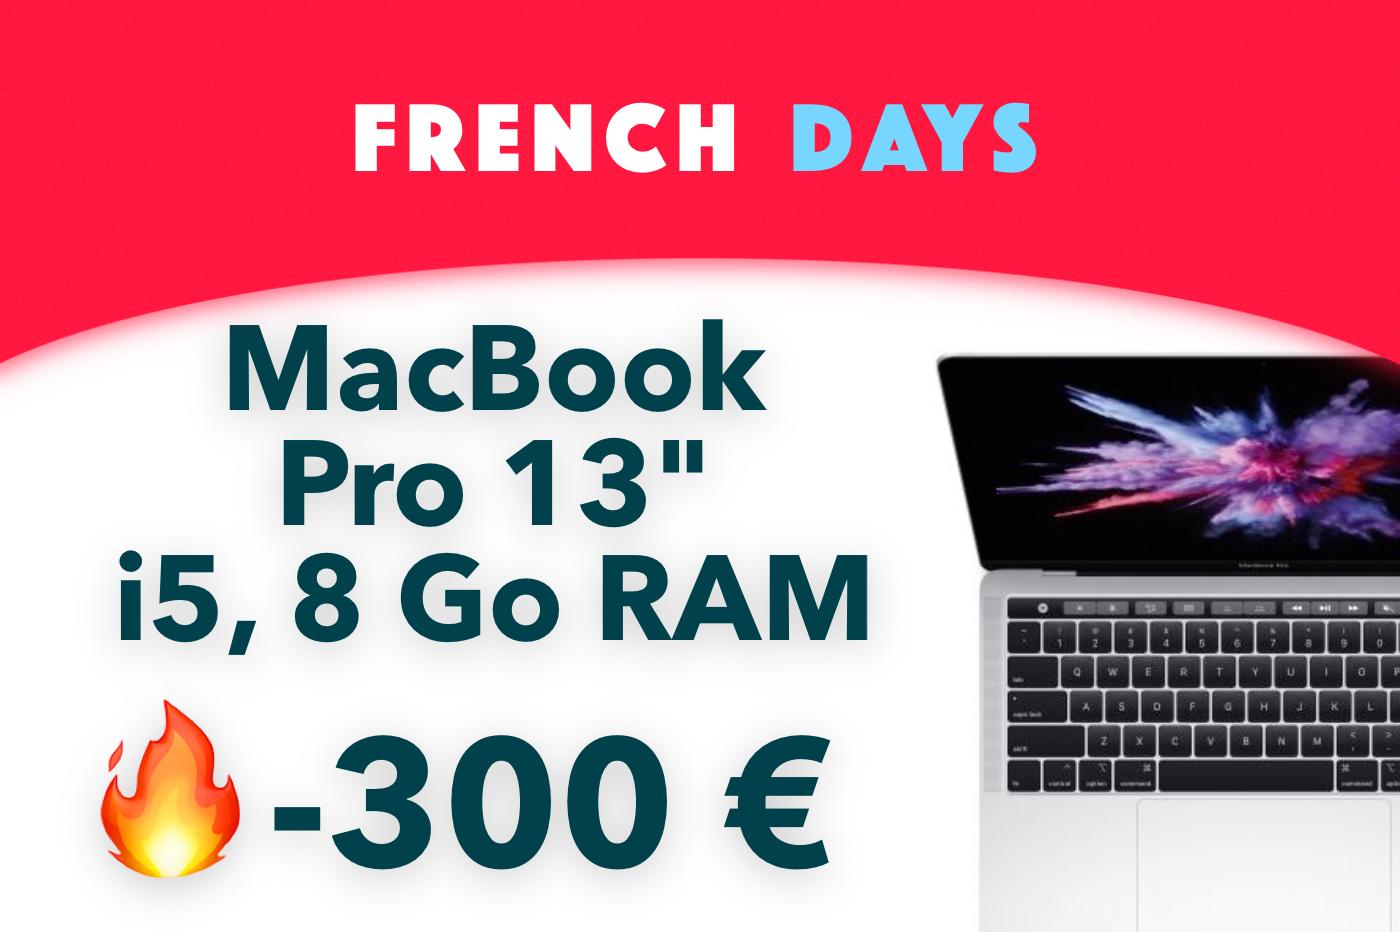 MacBook Pro French Days